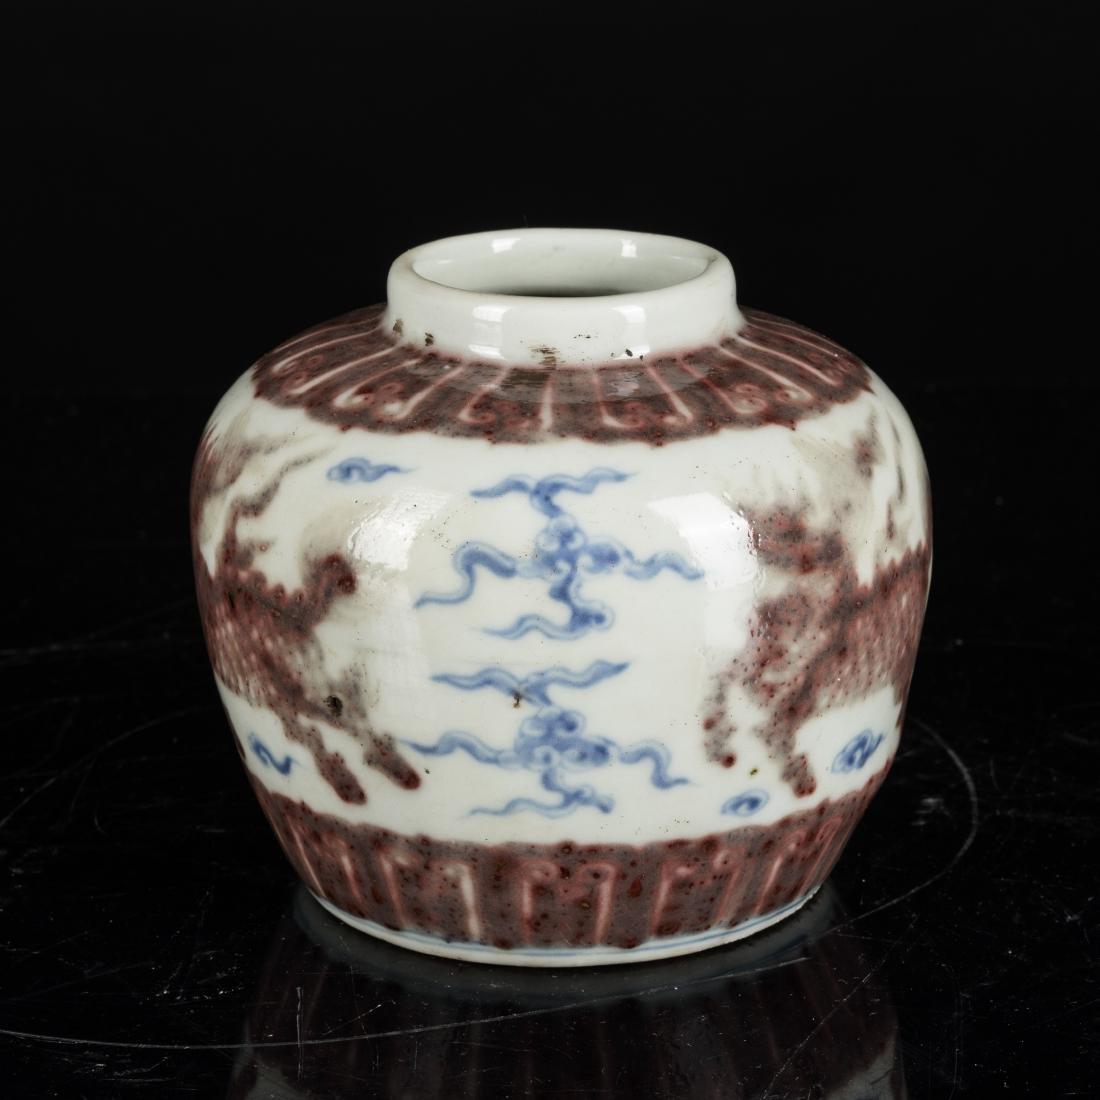 Late Ming Antique Porcelain Jar - 2